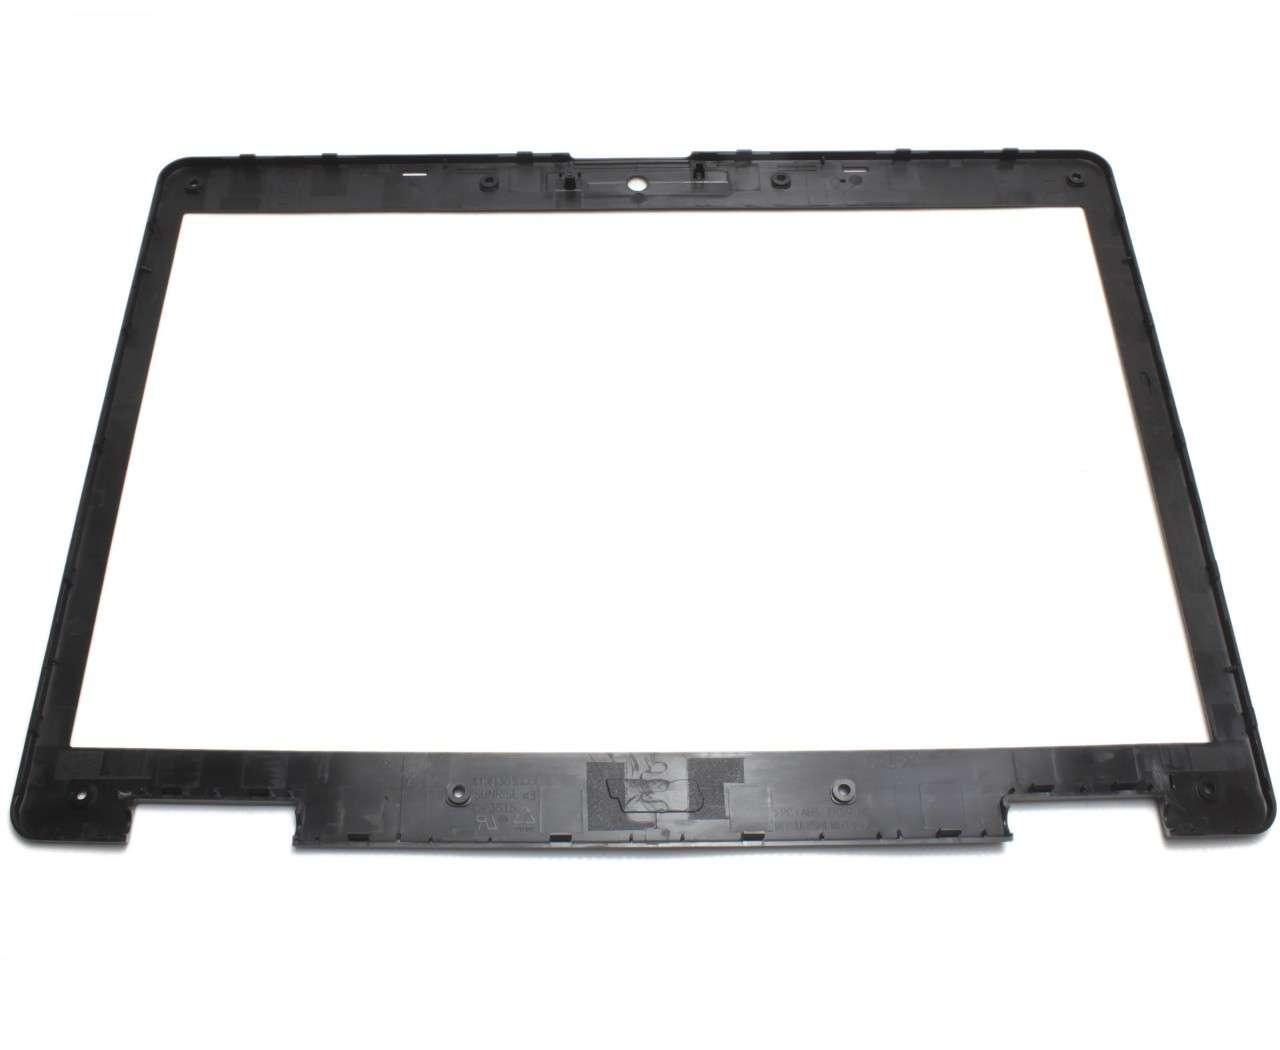 Rama Display Acer TravelMate 5320 Bezel Front Cover Neagra imagine